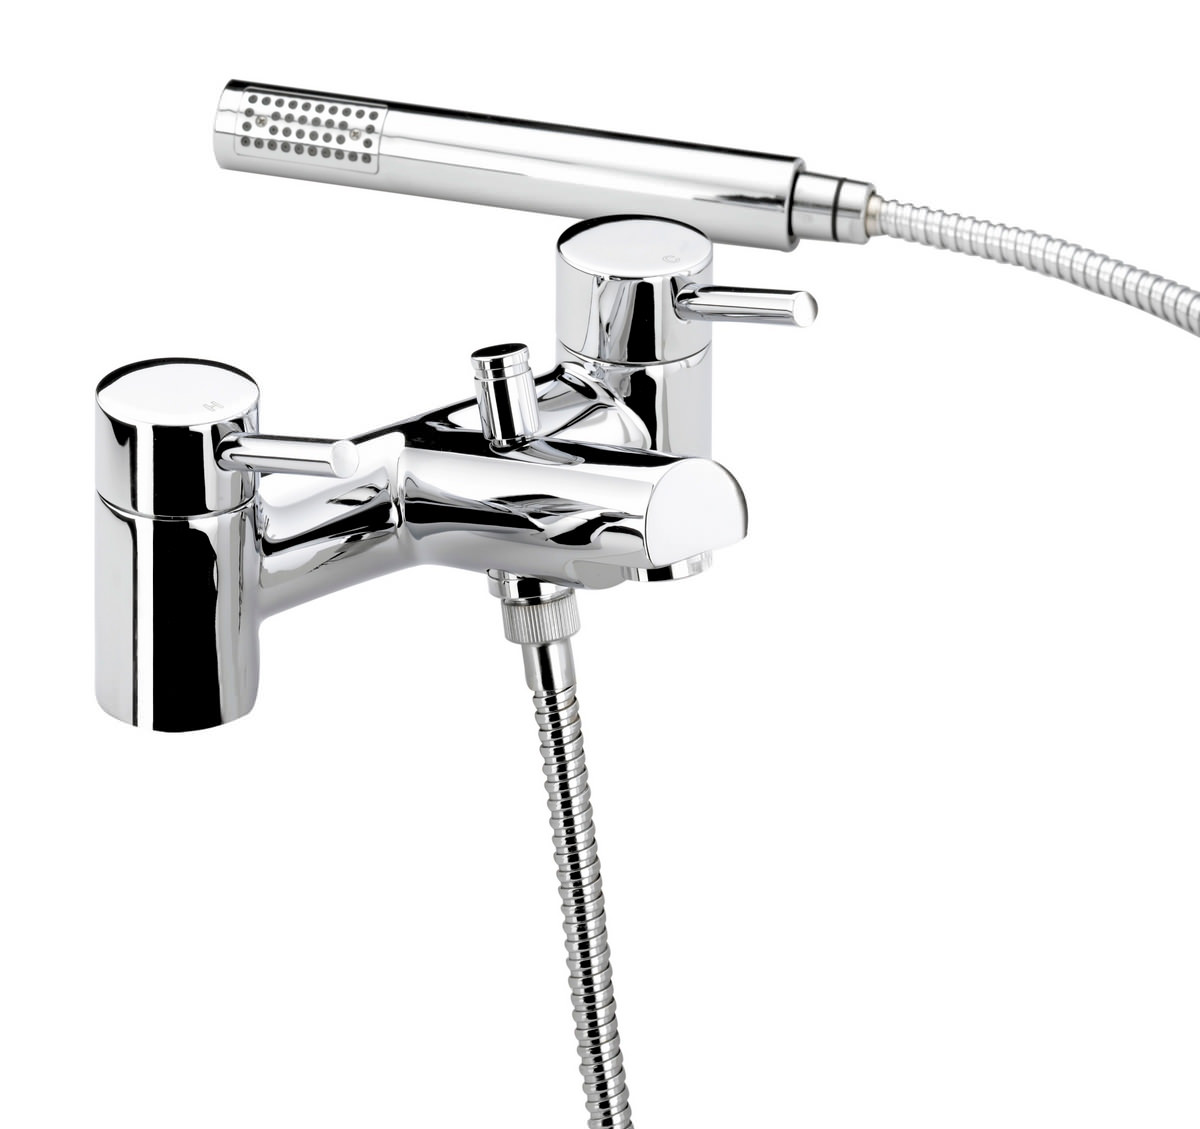 Bristan Prism Pillar Bath Shower Mixer Tap With Kit